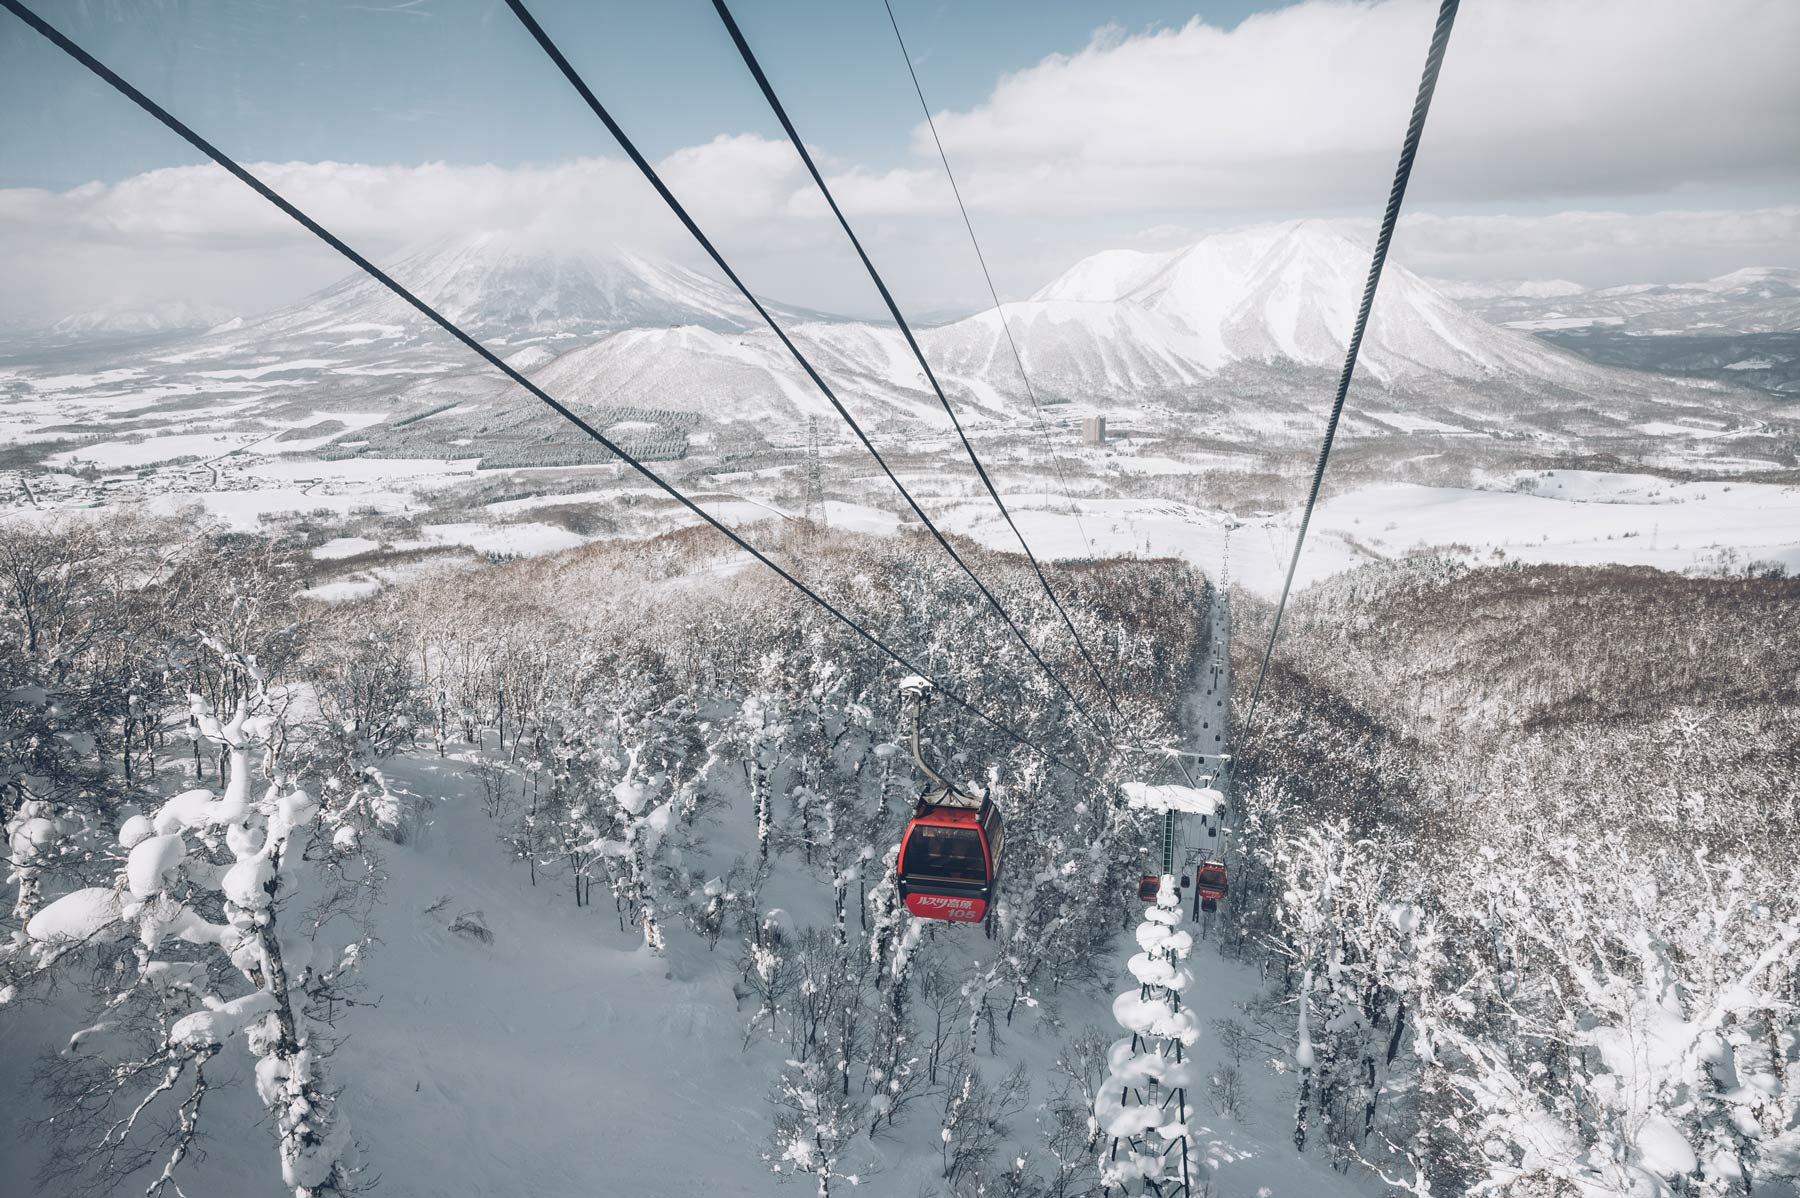 Ou skier au Japon? A Rusutsu sur l'ile d'Hokkaido